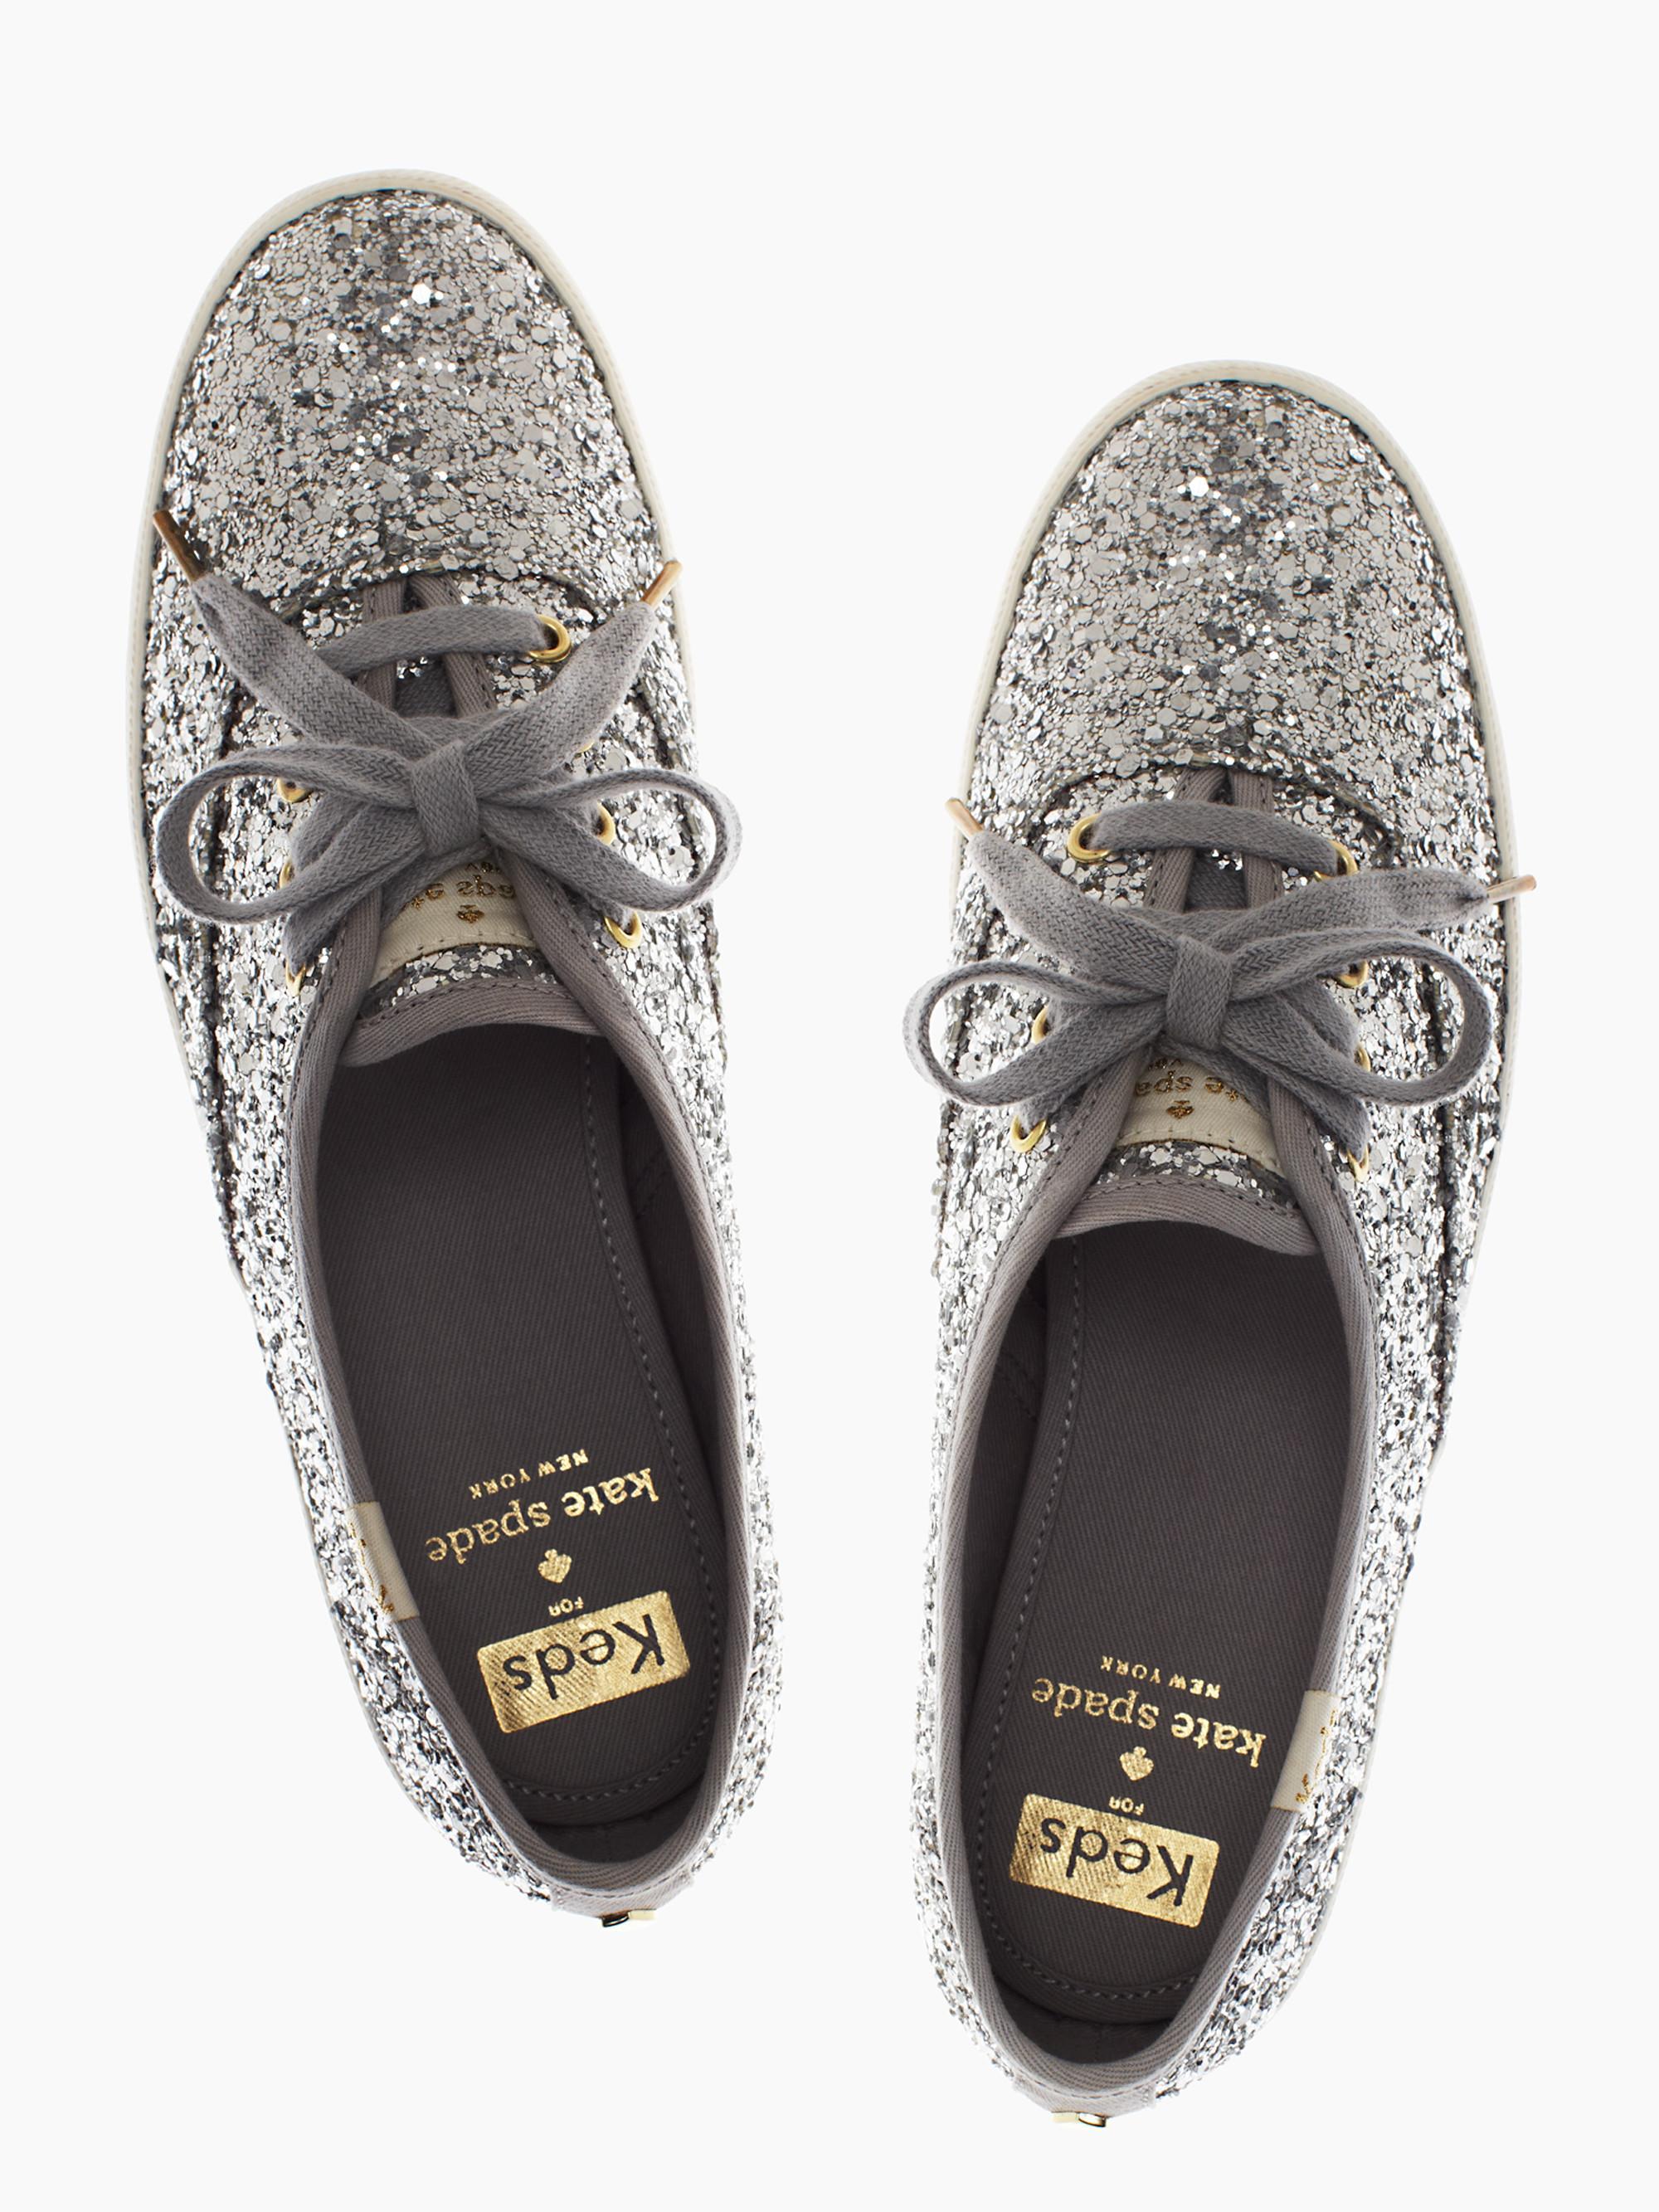 Kate Spade New York Keds For Glitter Sneakers In Metallic